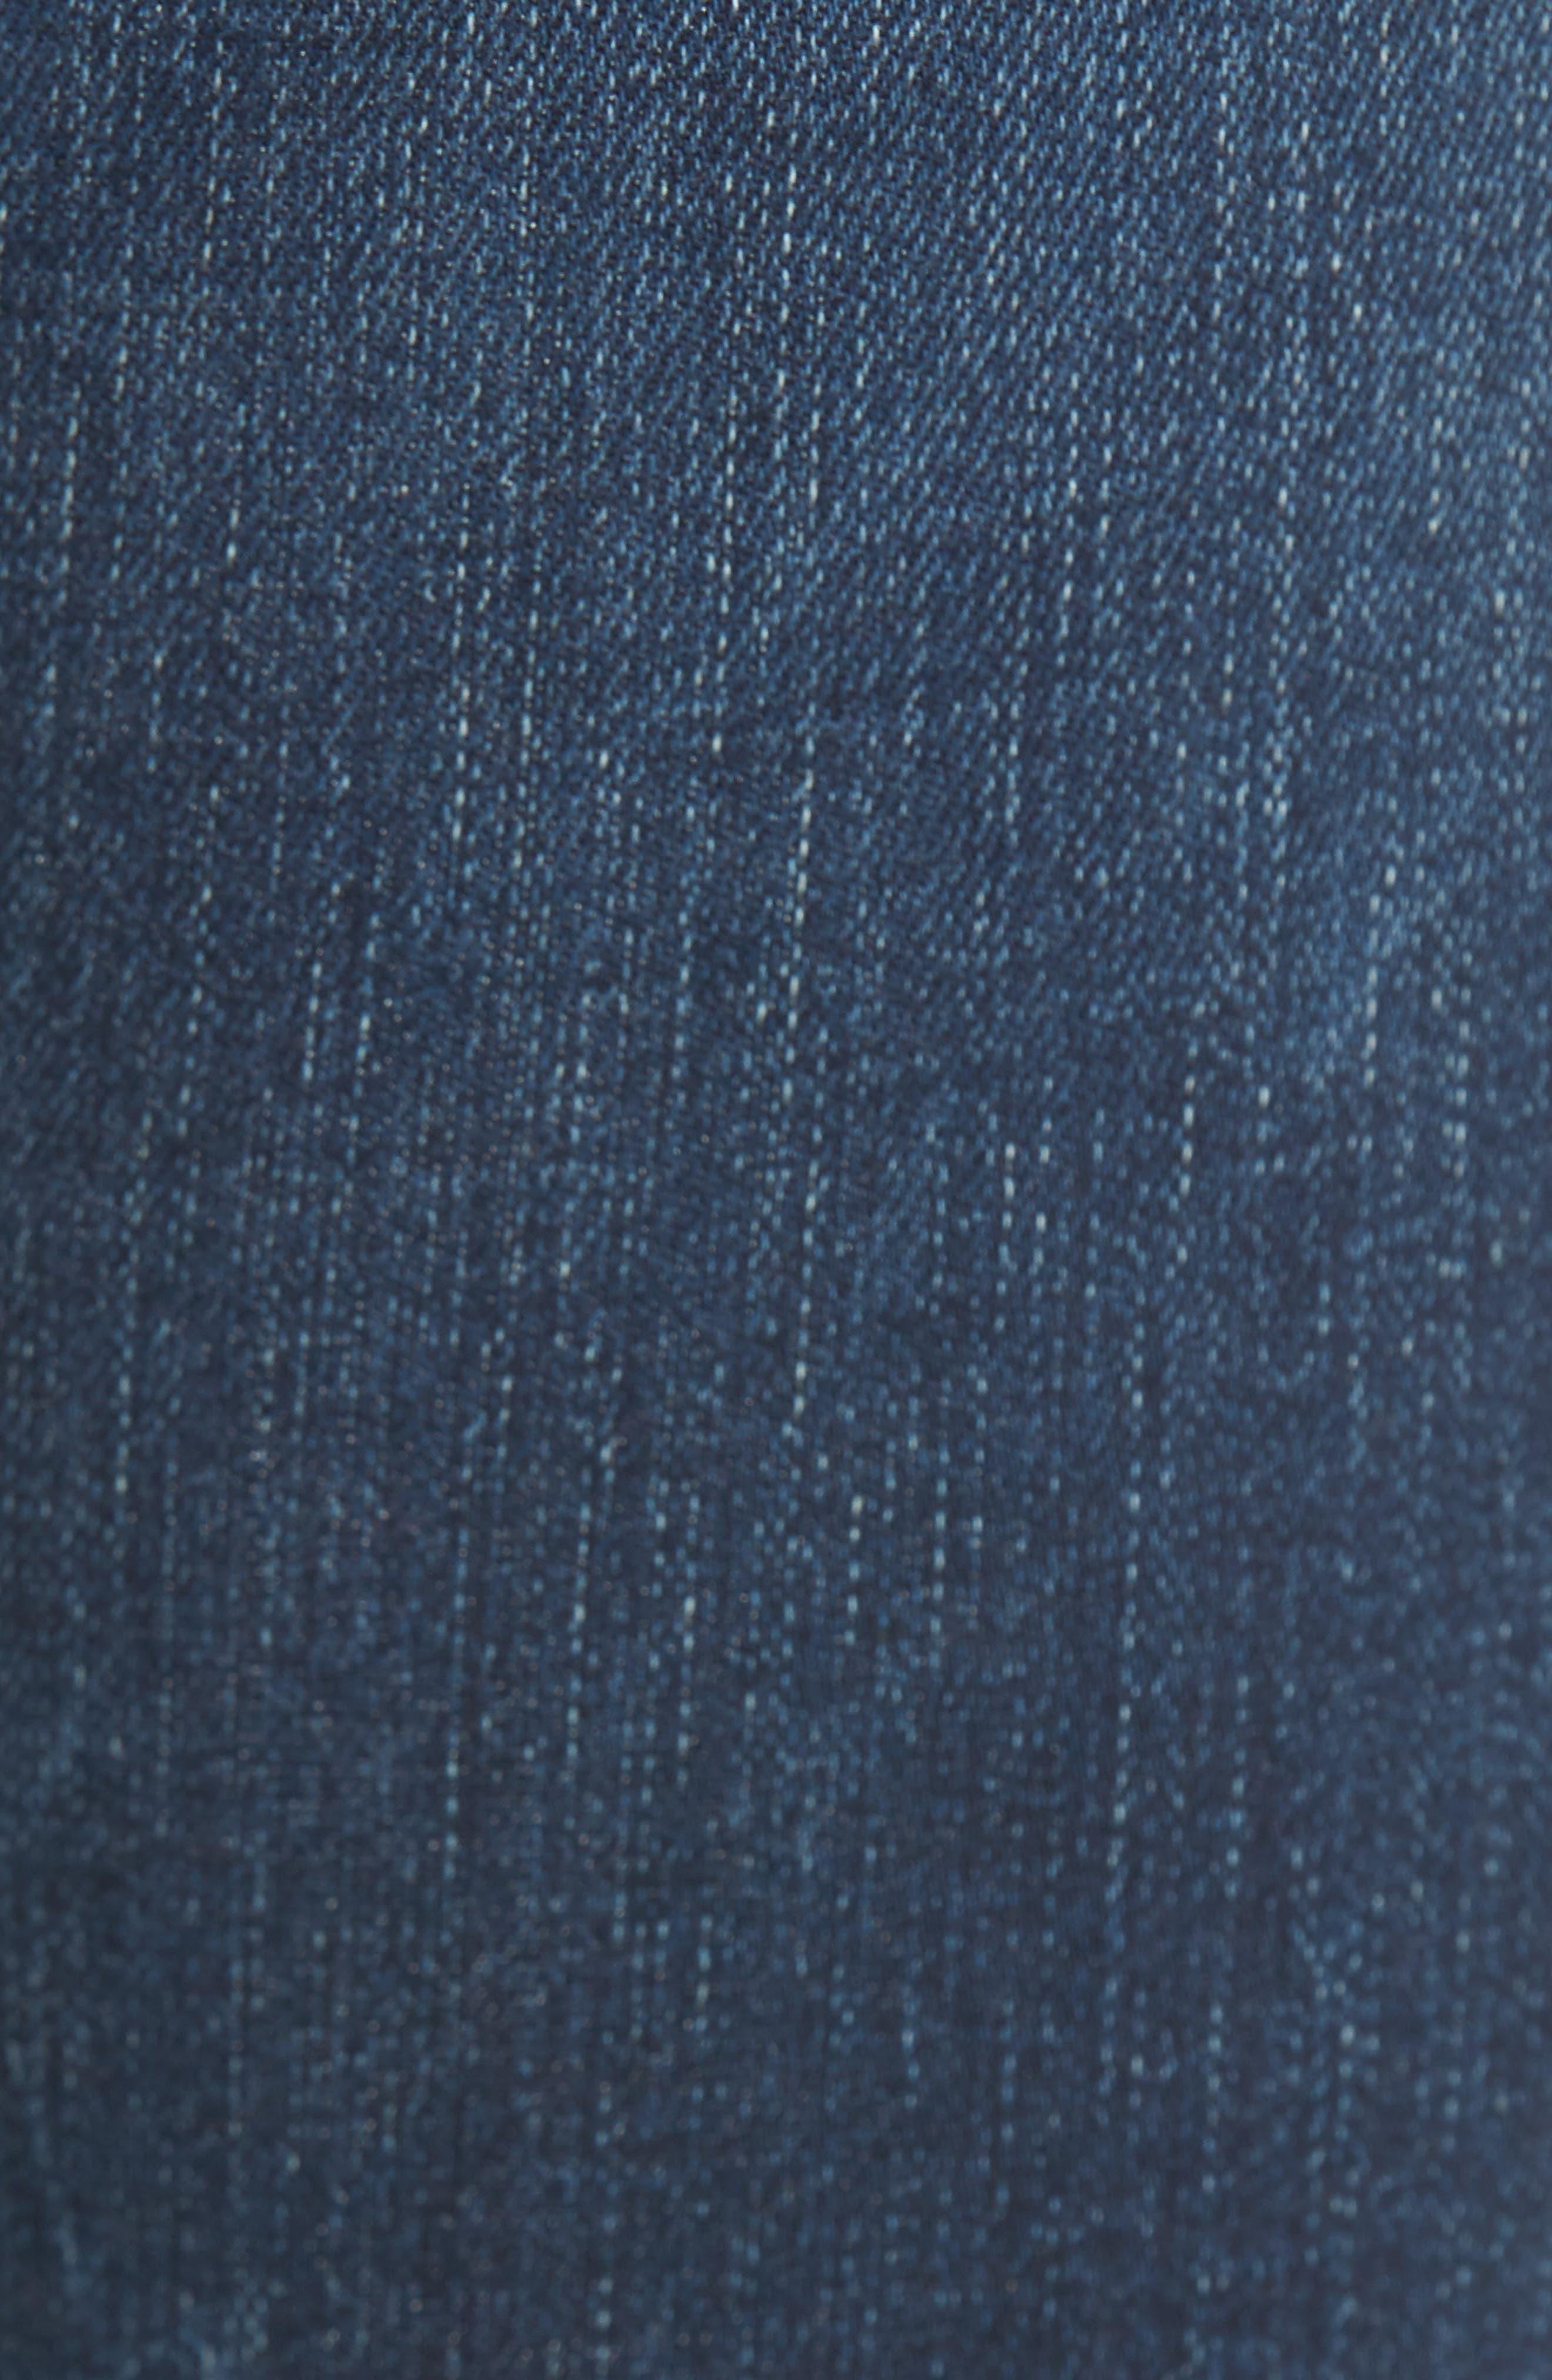 Sleep Song Skinny Jeans,                             Alternate thumbnail 5, color,                             400